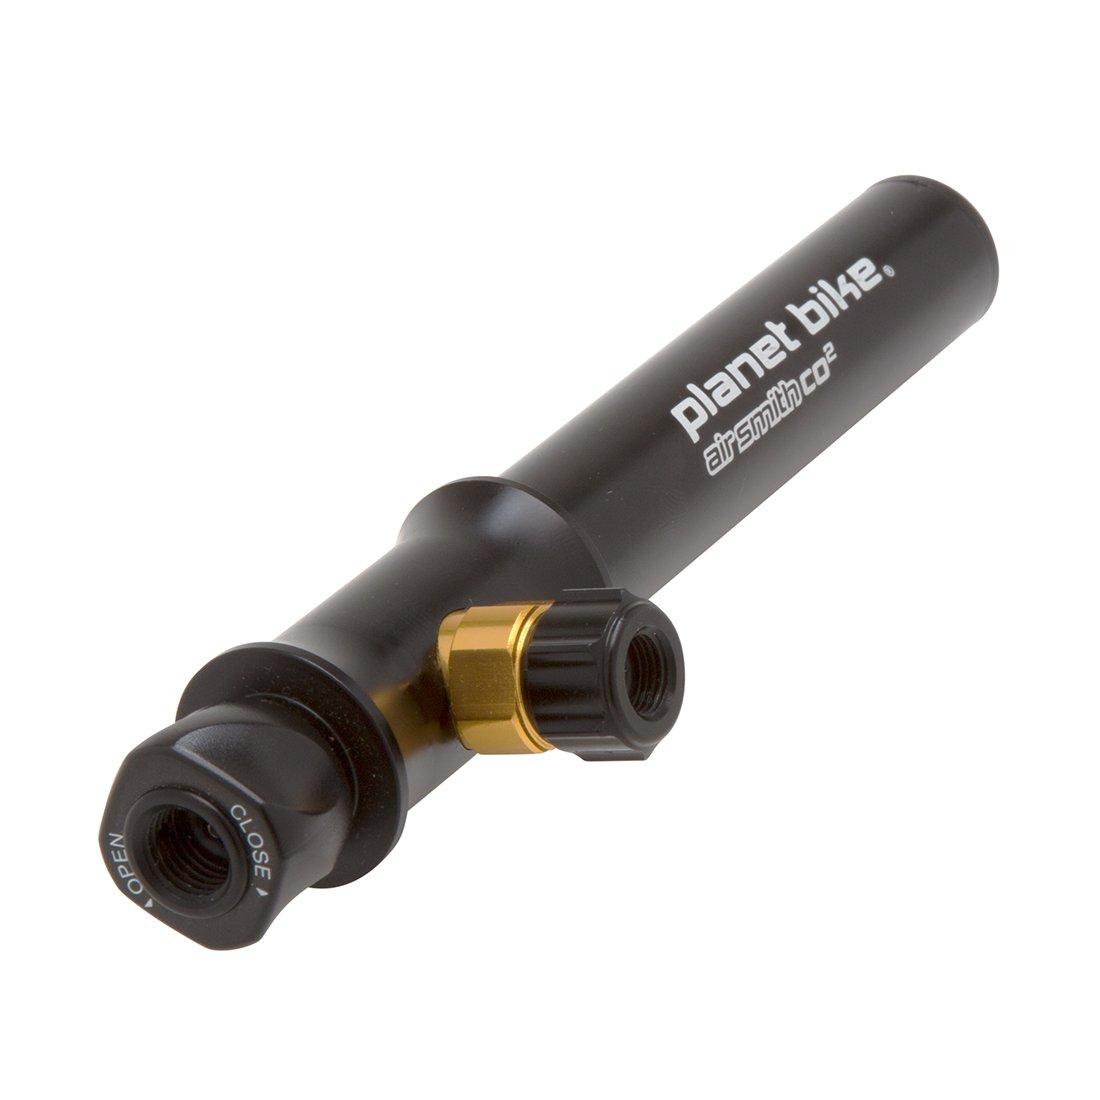 Planet Bike Air Smith CO2 bike tire inflator and mini pump